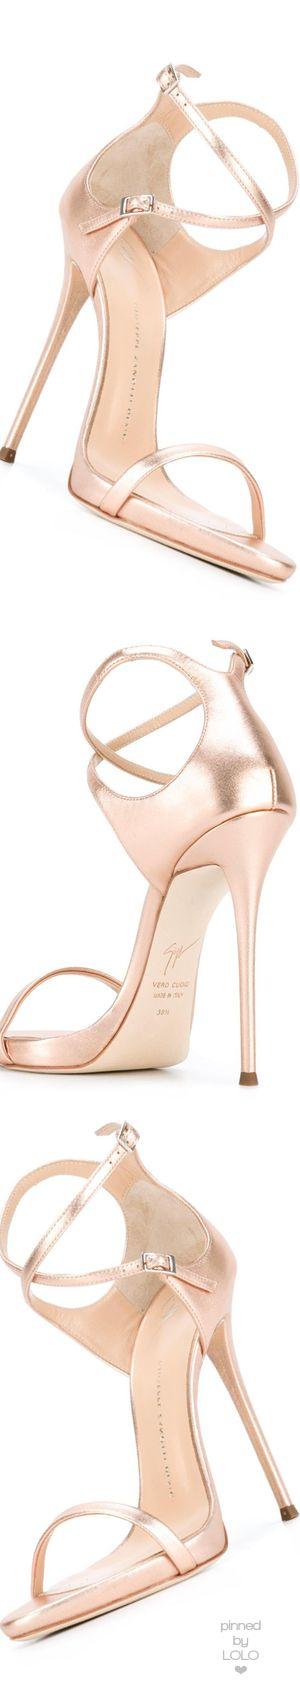 GIUSEPPE ZANOTTI DESIGN  'Darcie' Sandals | LOLO❤︎ #shoeshighheelsfancy